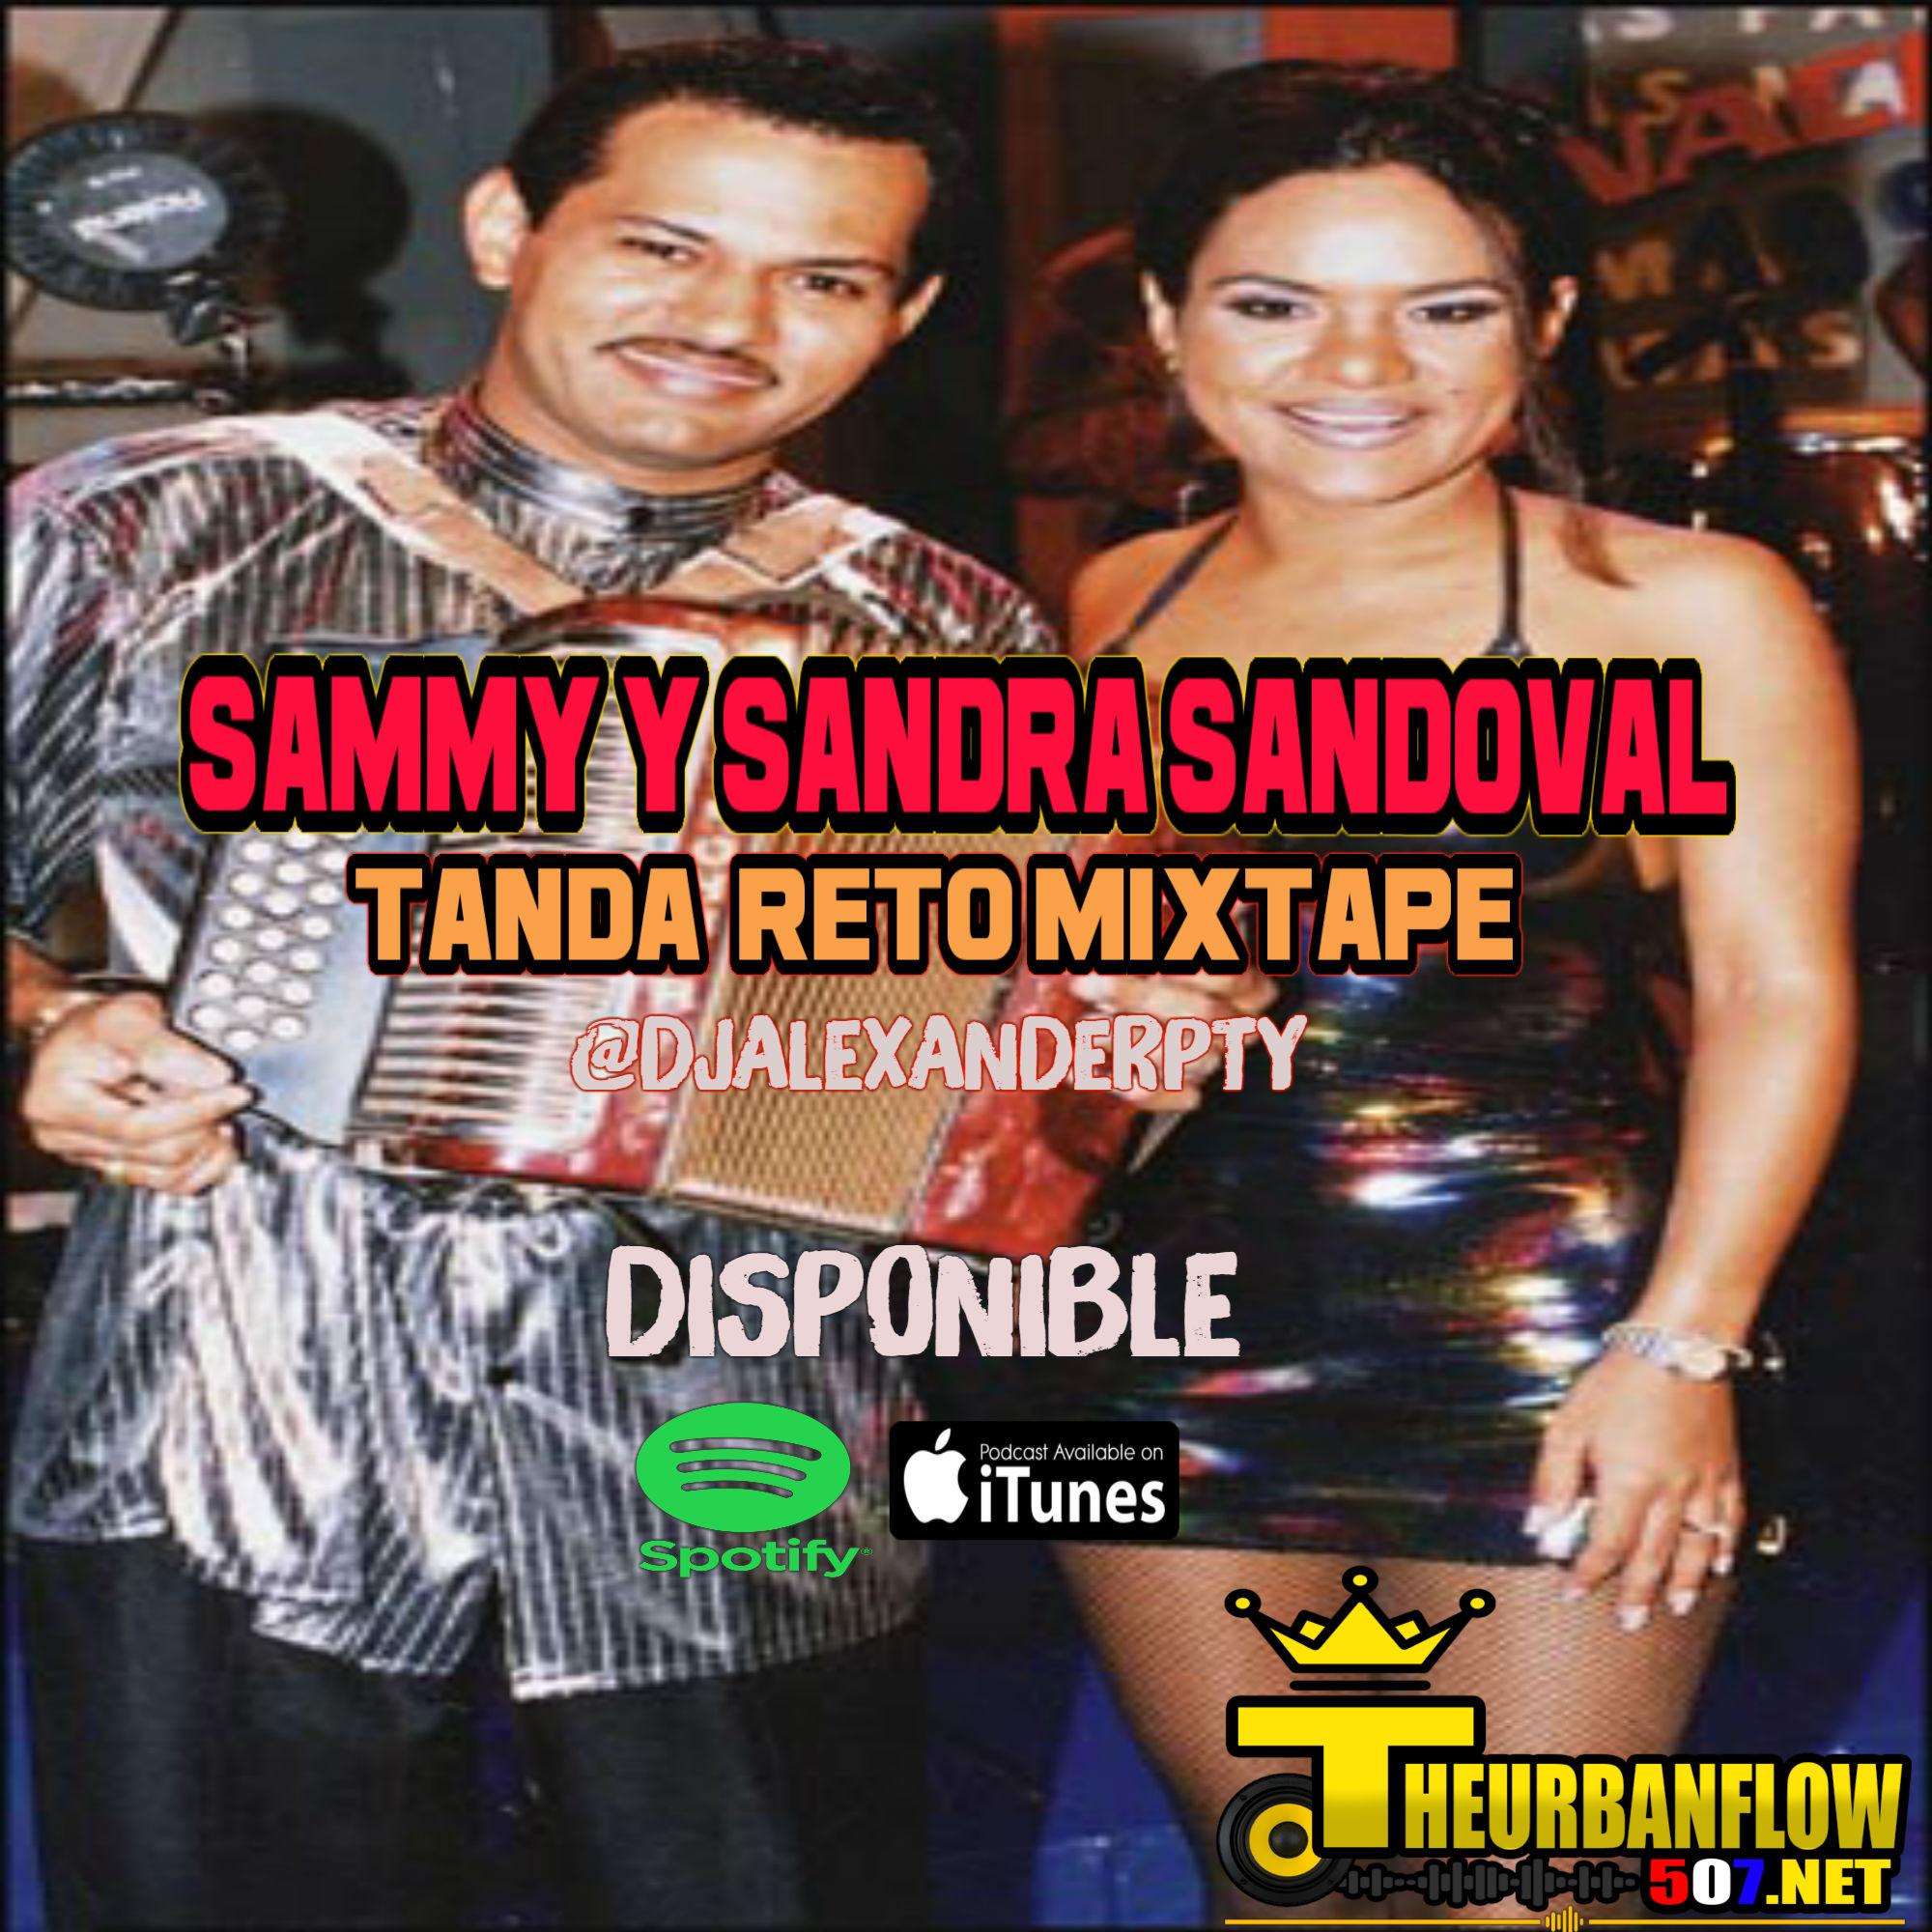 SAMMY Y SANDRA SANDOVAL TANDA RETRO MIXTAPE